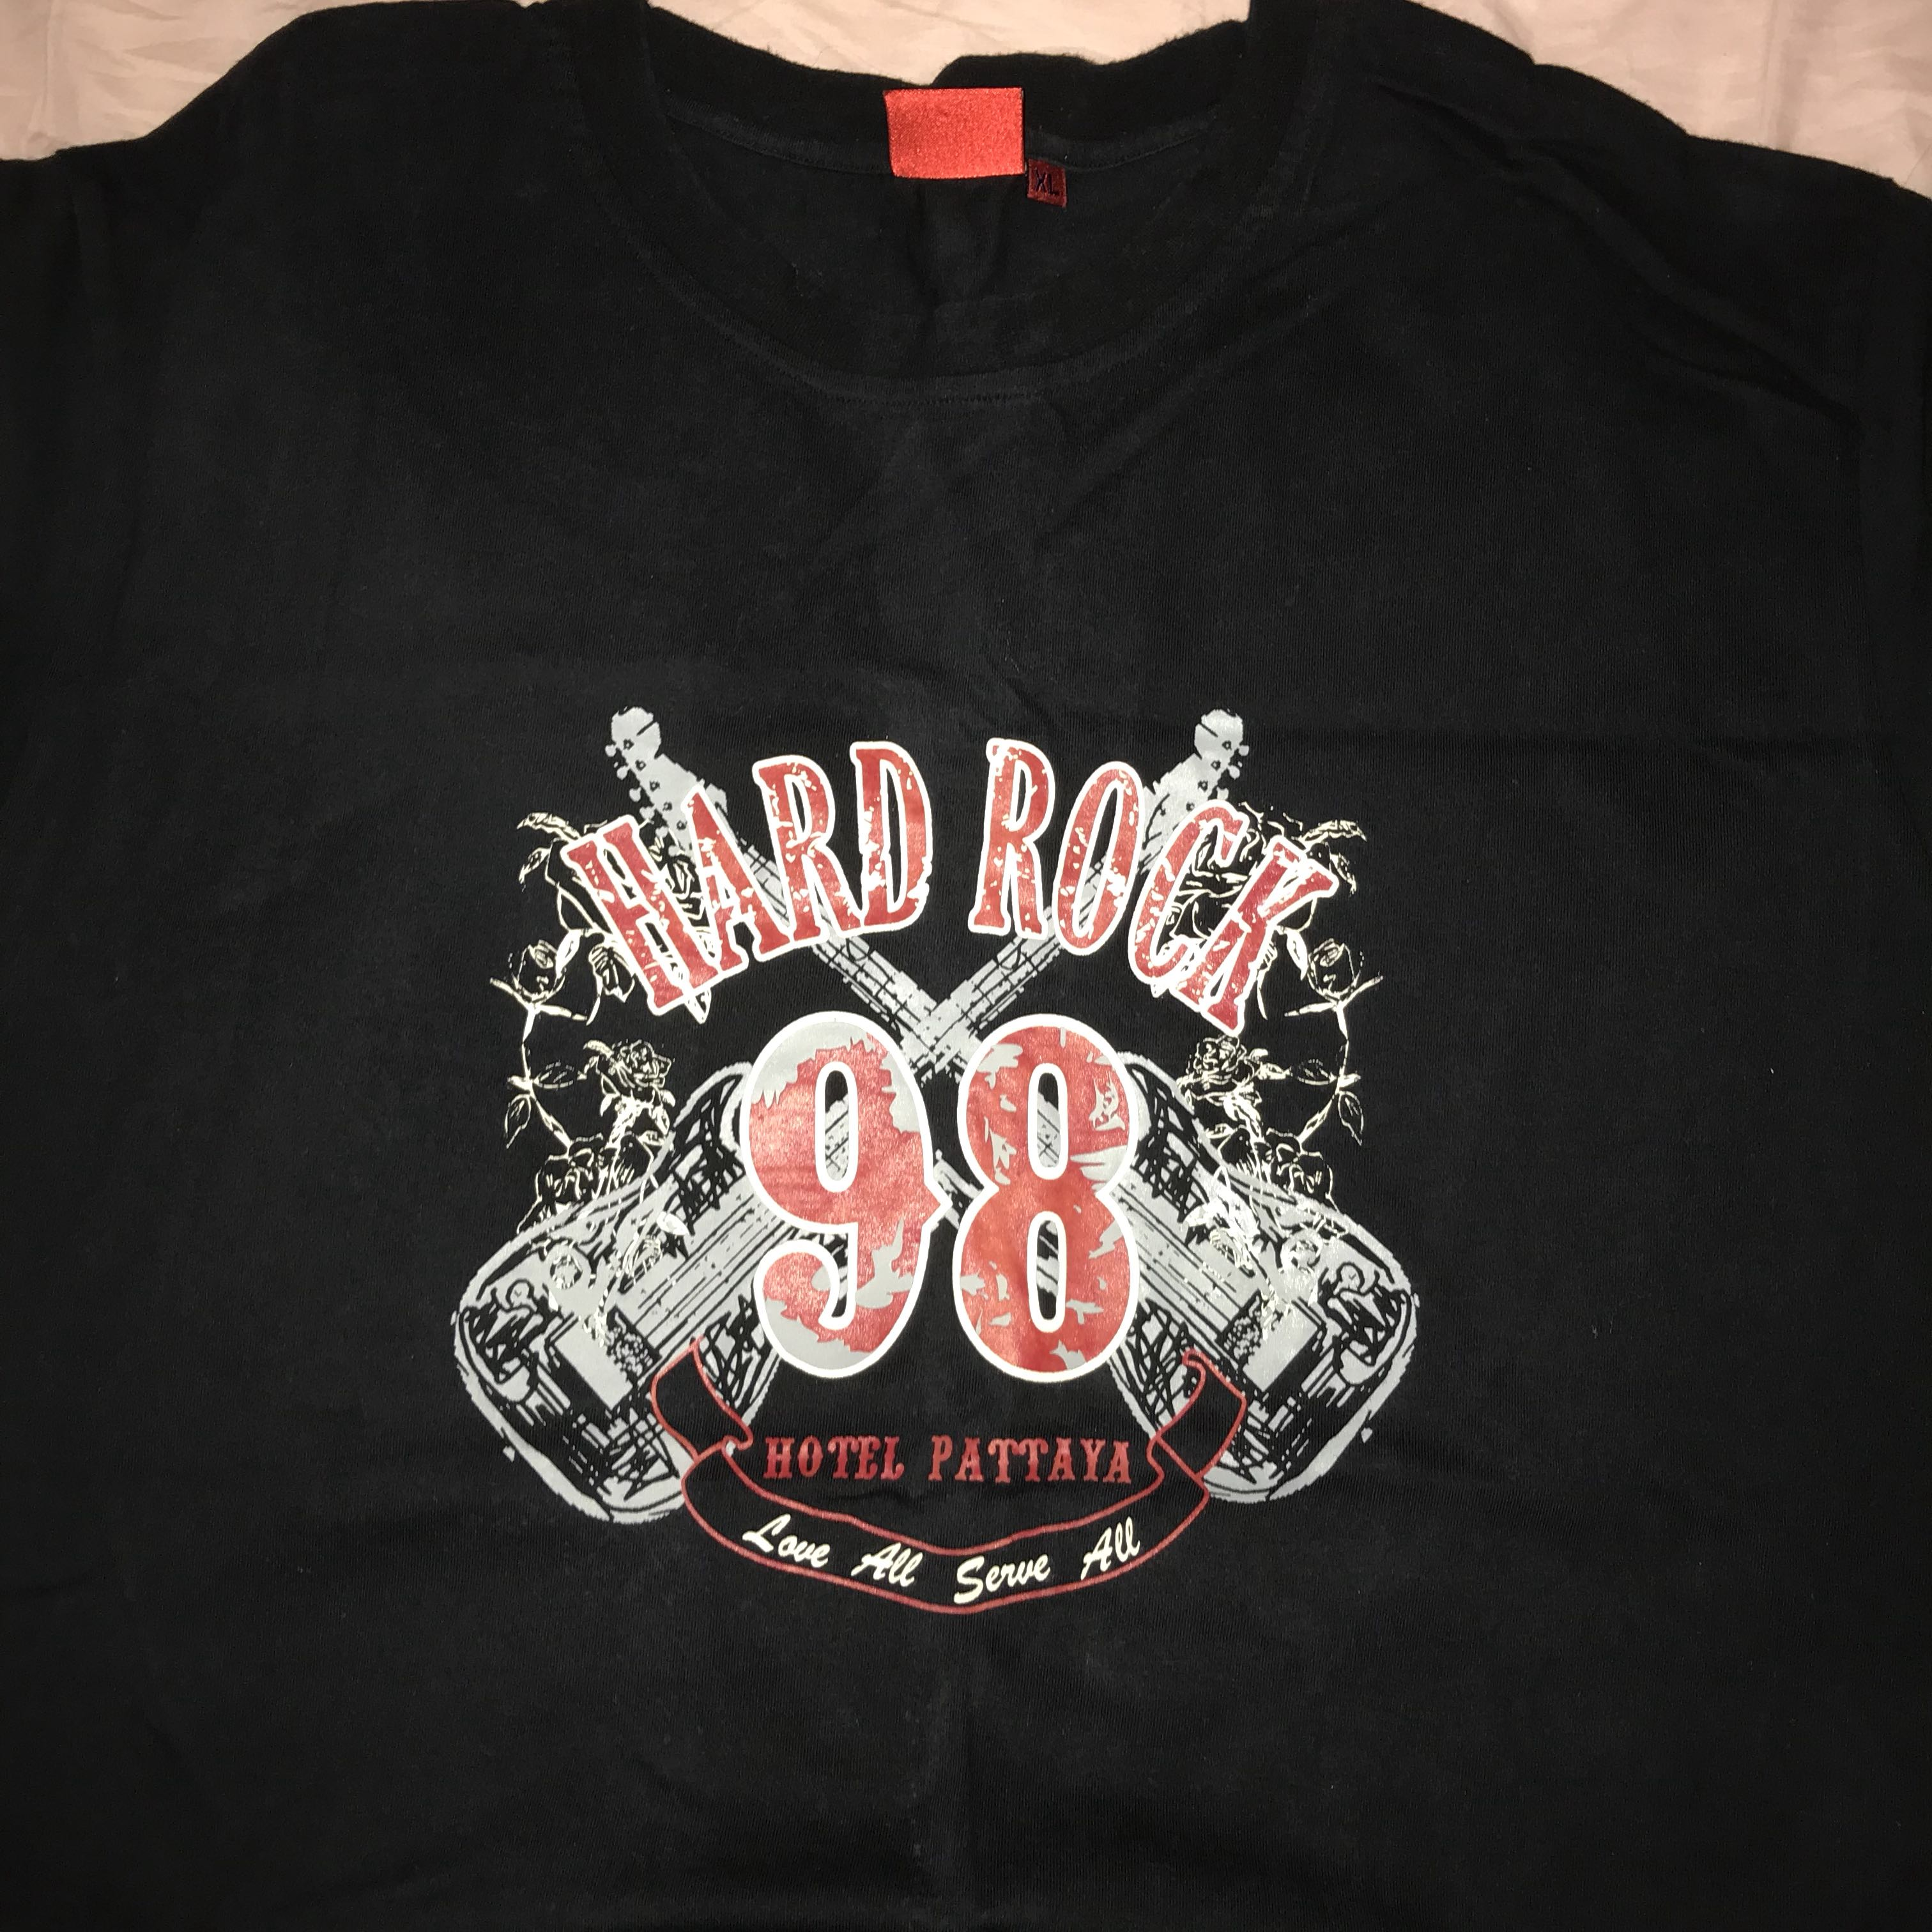 Hard rock authentic t-shirt